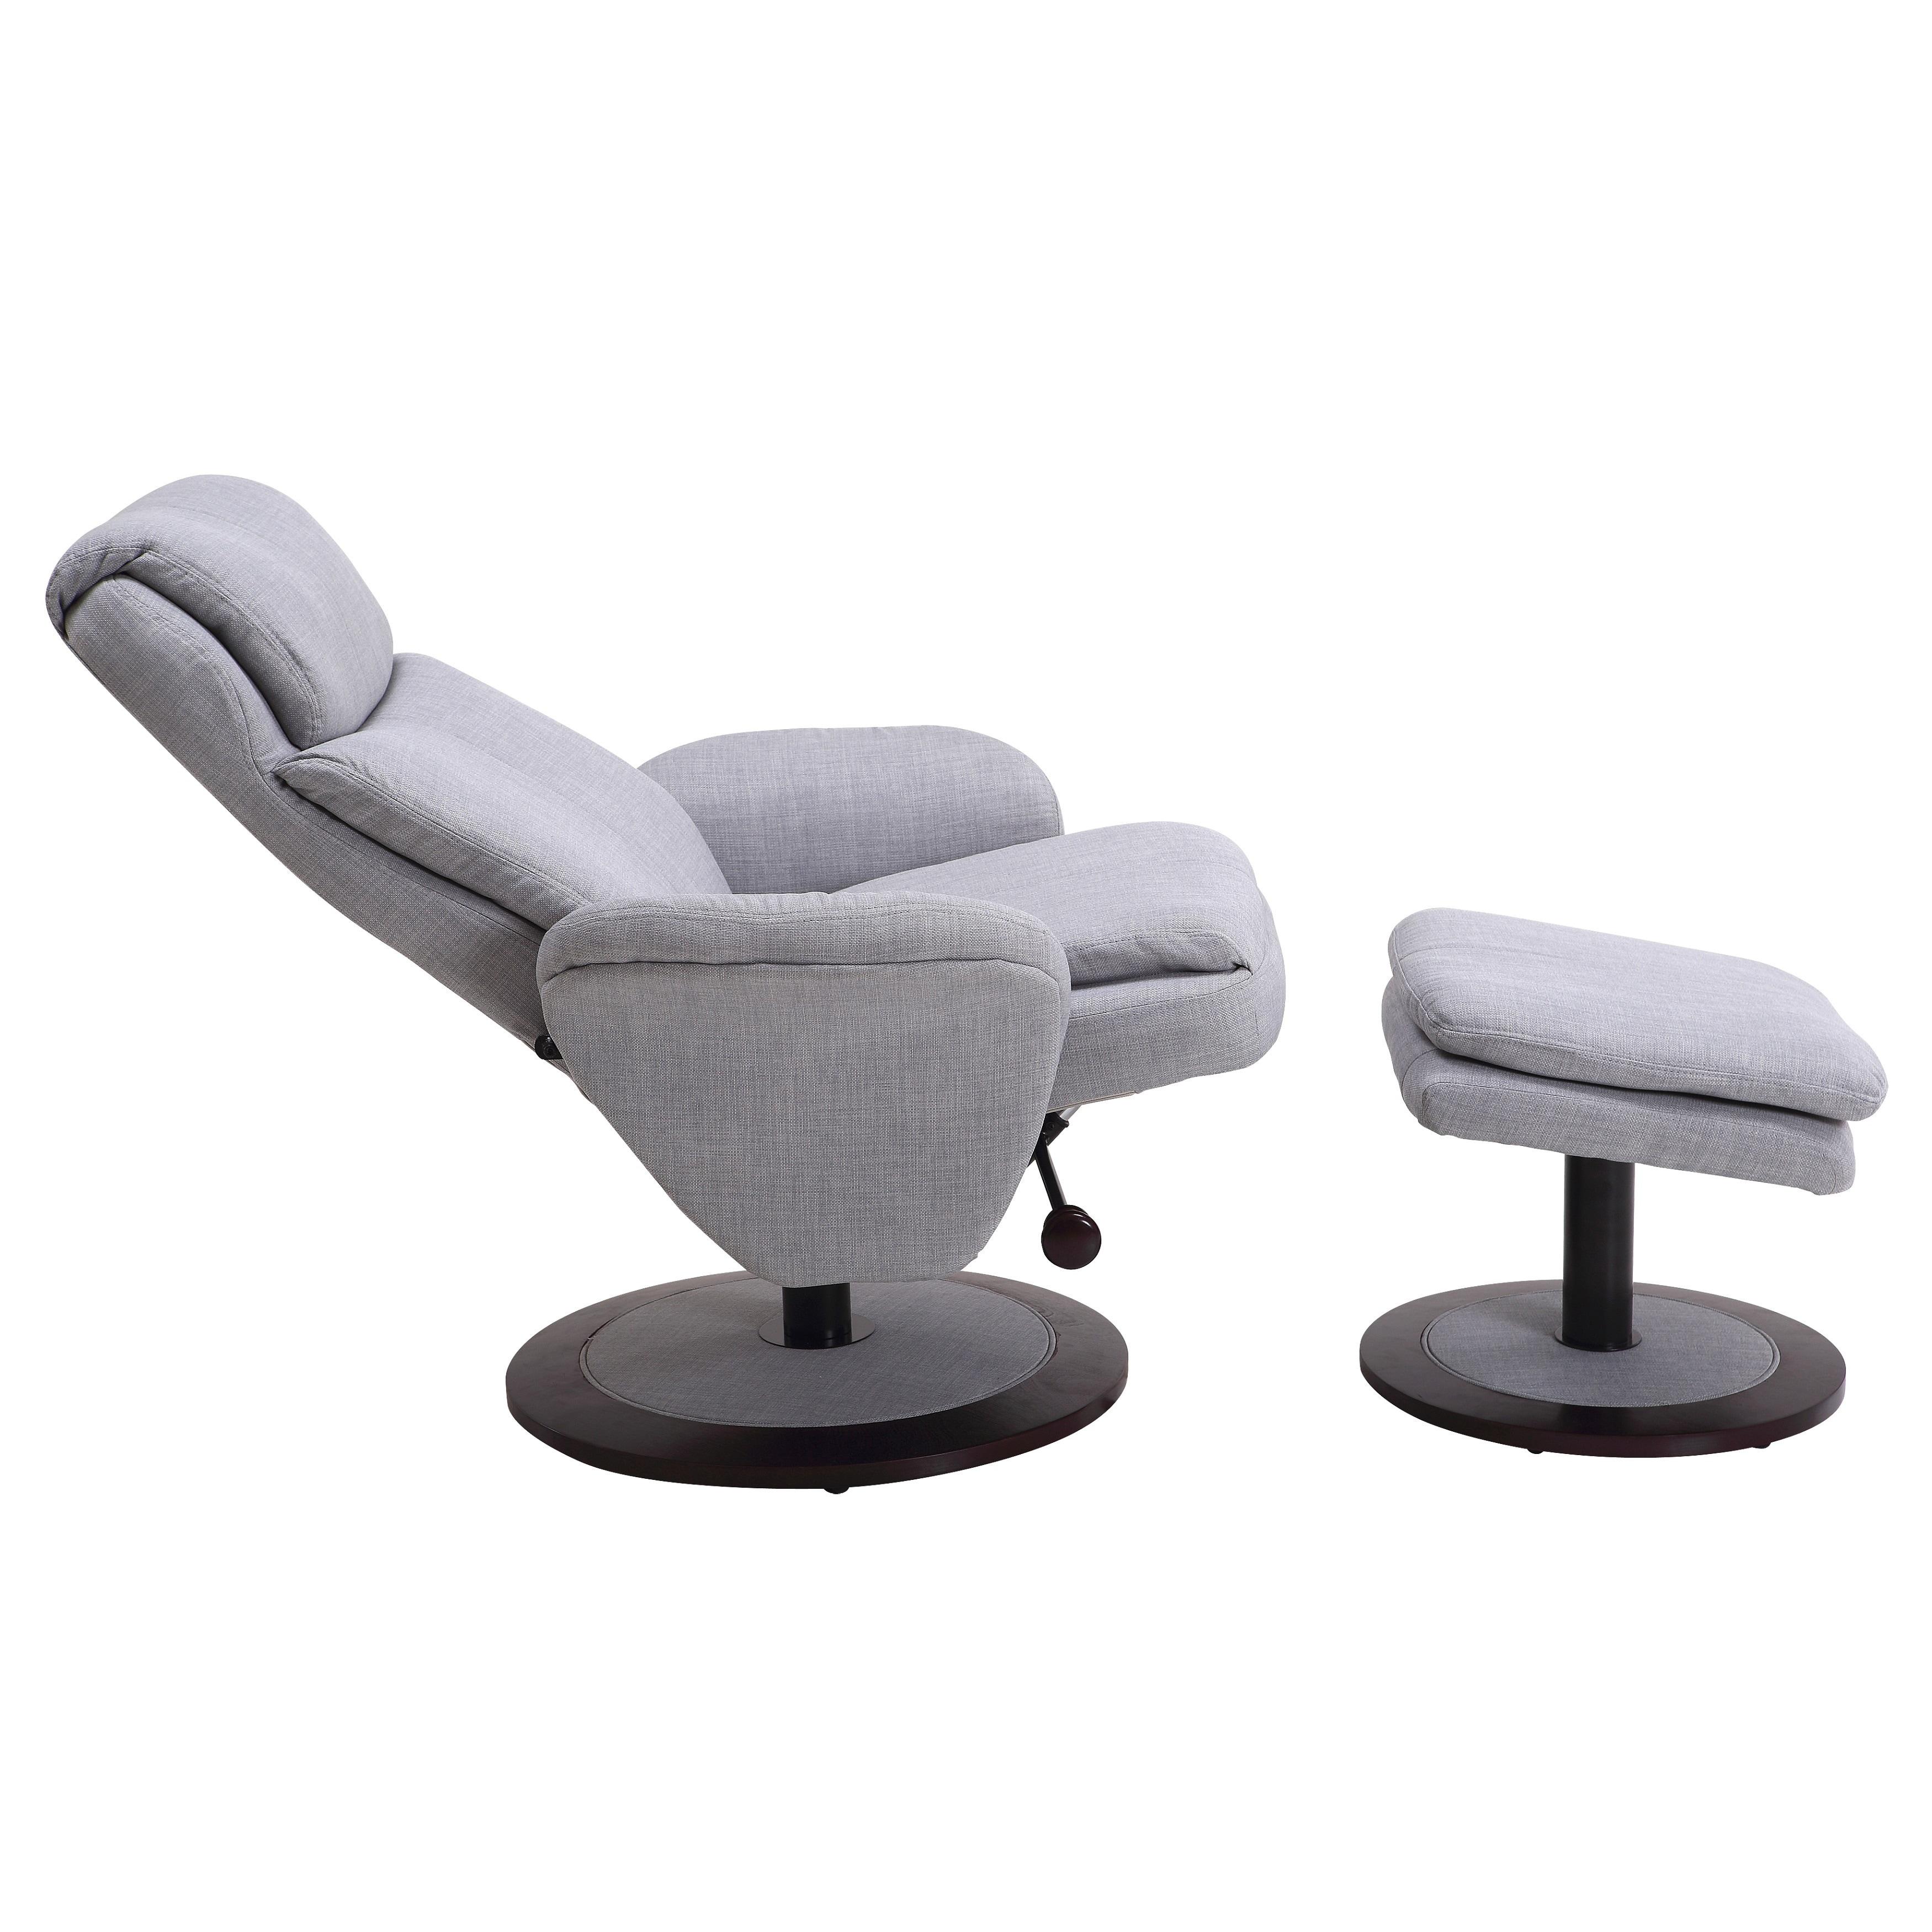 Wondrous Berum Collection Light Grey Fabric Swivel Recliner With Ottoman Machost Co Dining Chair Design Ideas Machostcouk